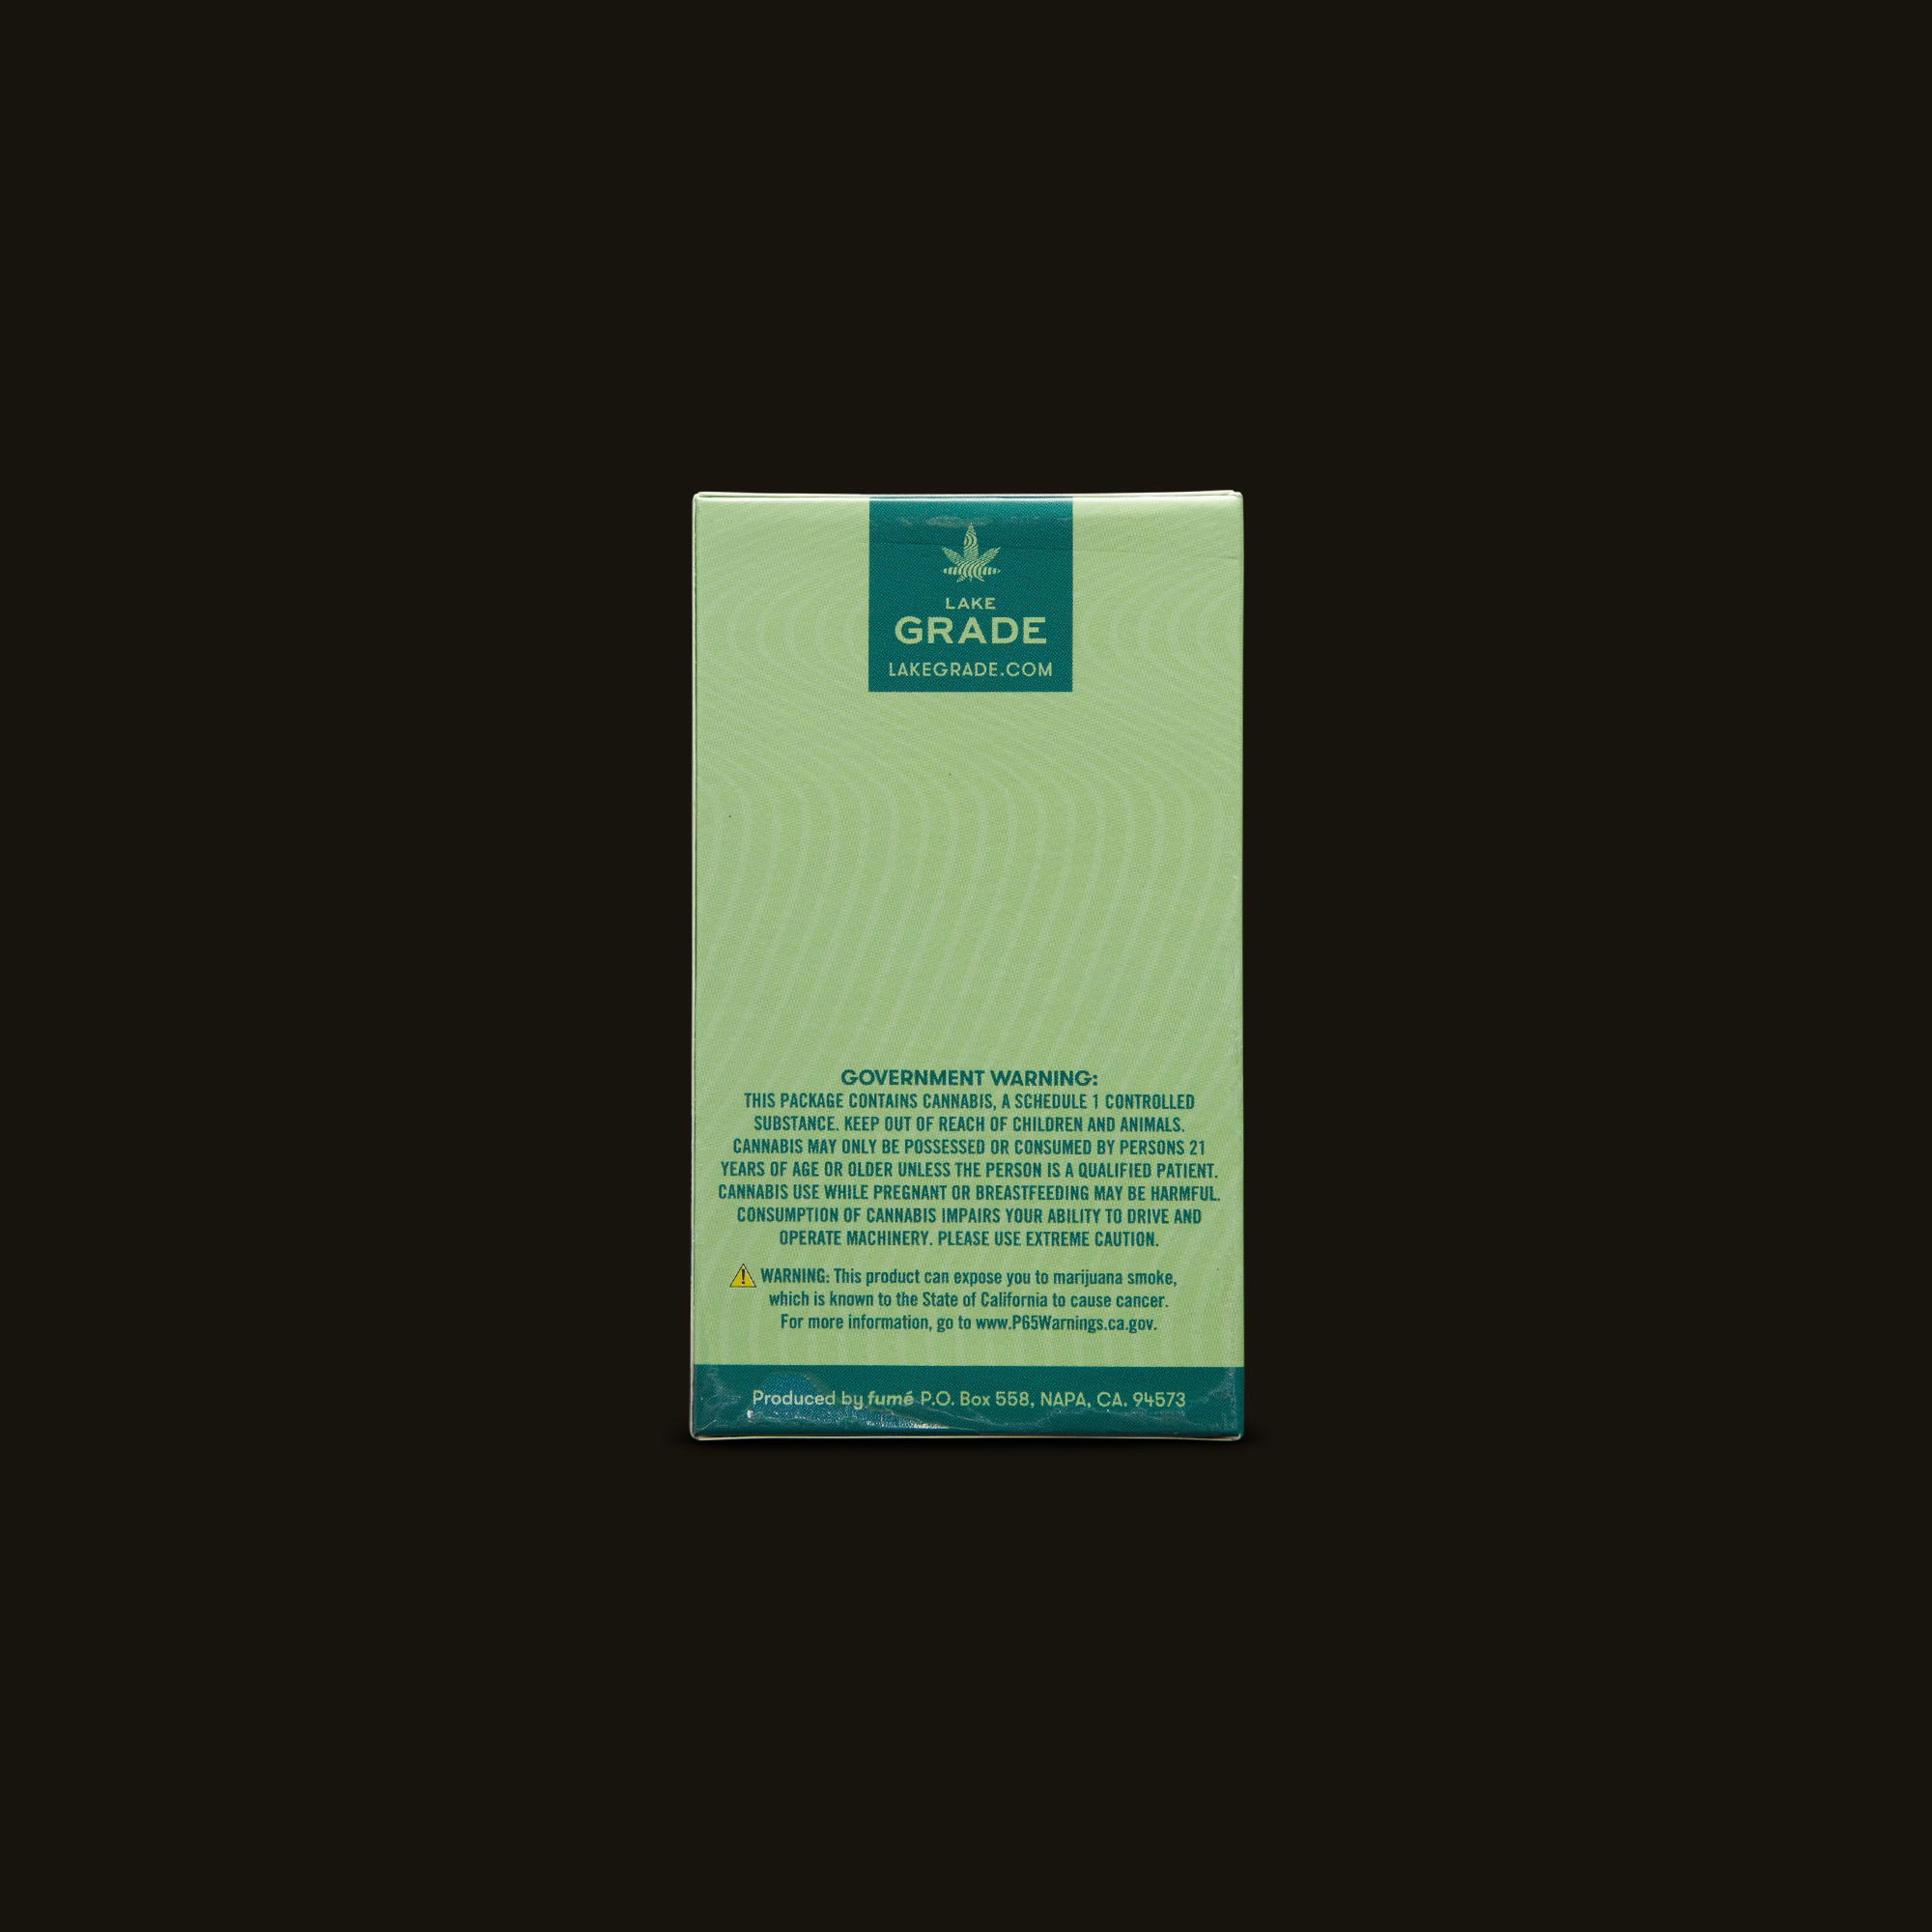 Lakegrade Budzilla Pre-Roll 5-Pack Back Packaging